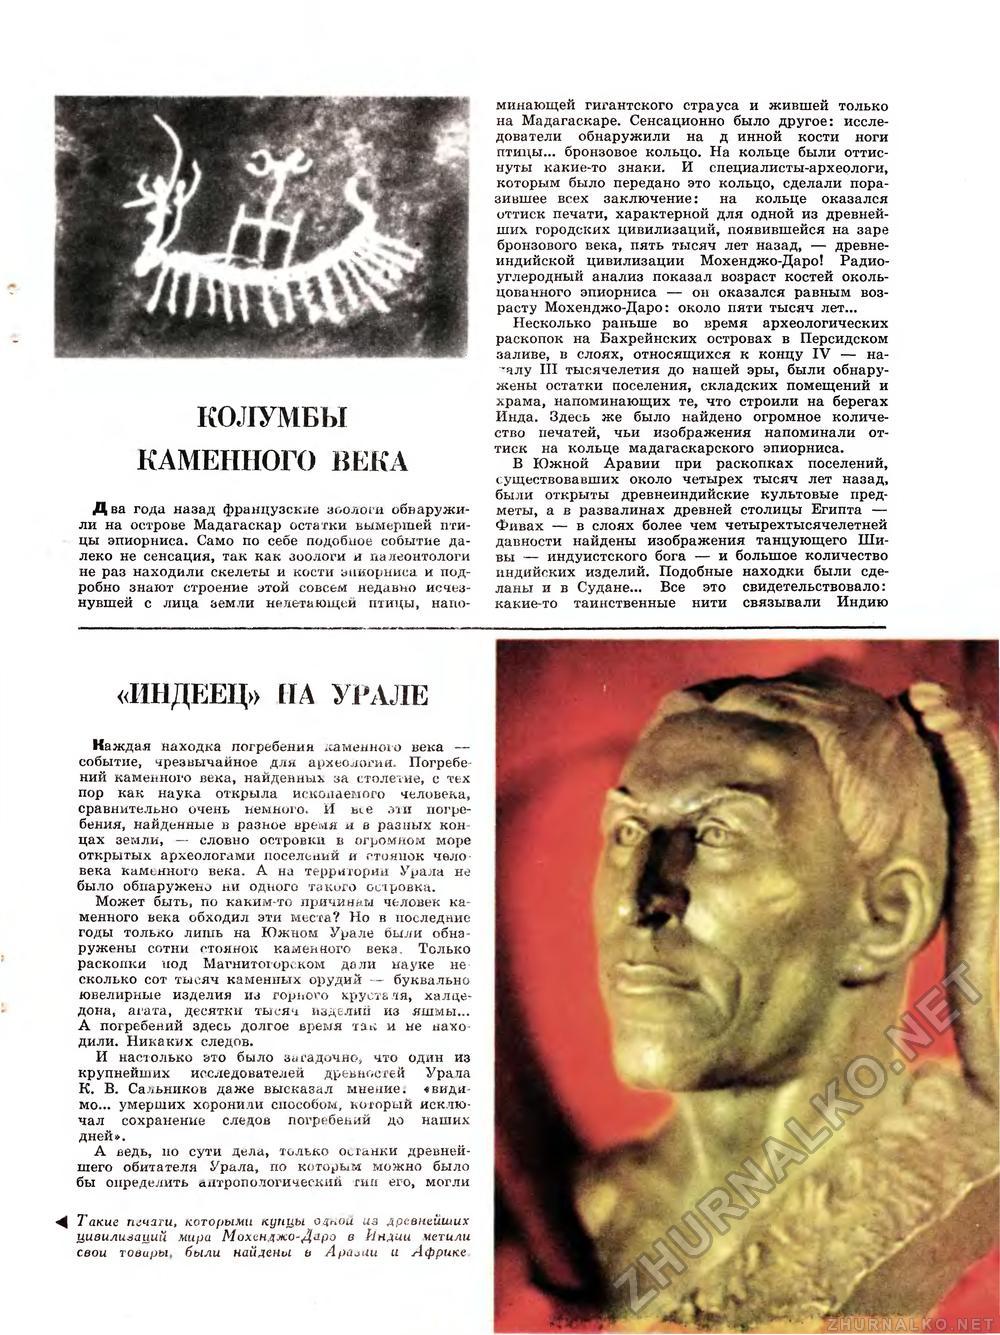 http://zhurnalko.net/images/4/8/48162dd6e36b561762aa/page0031.jpg